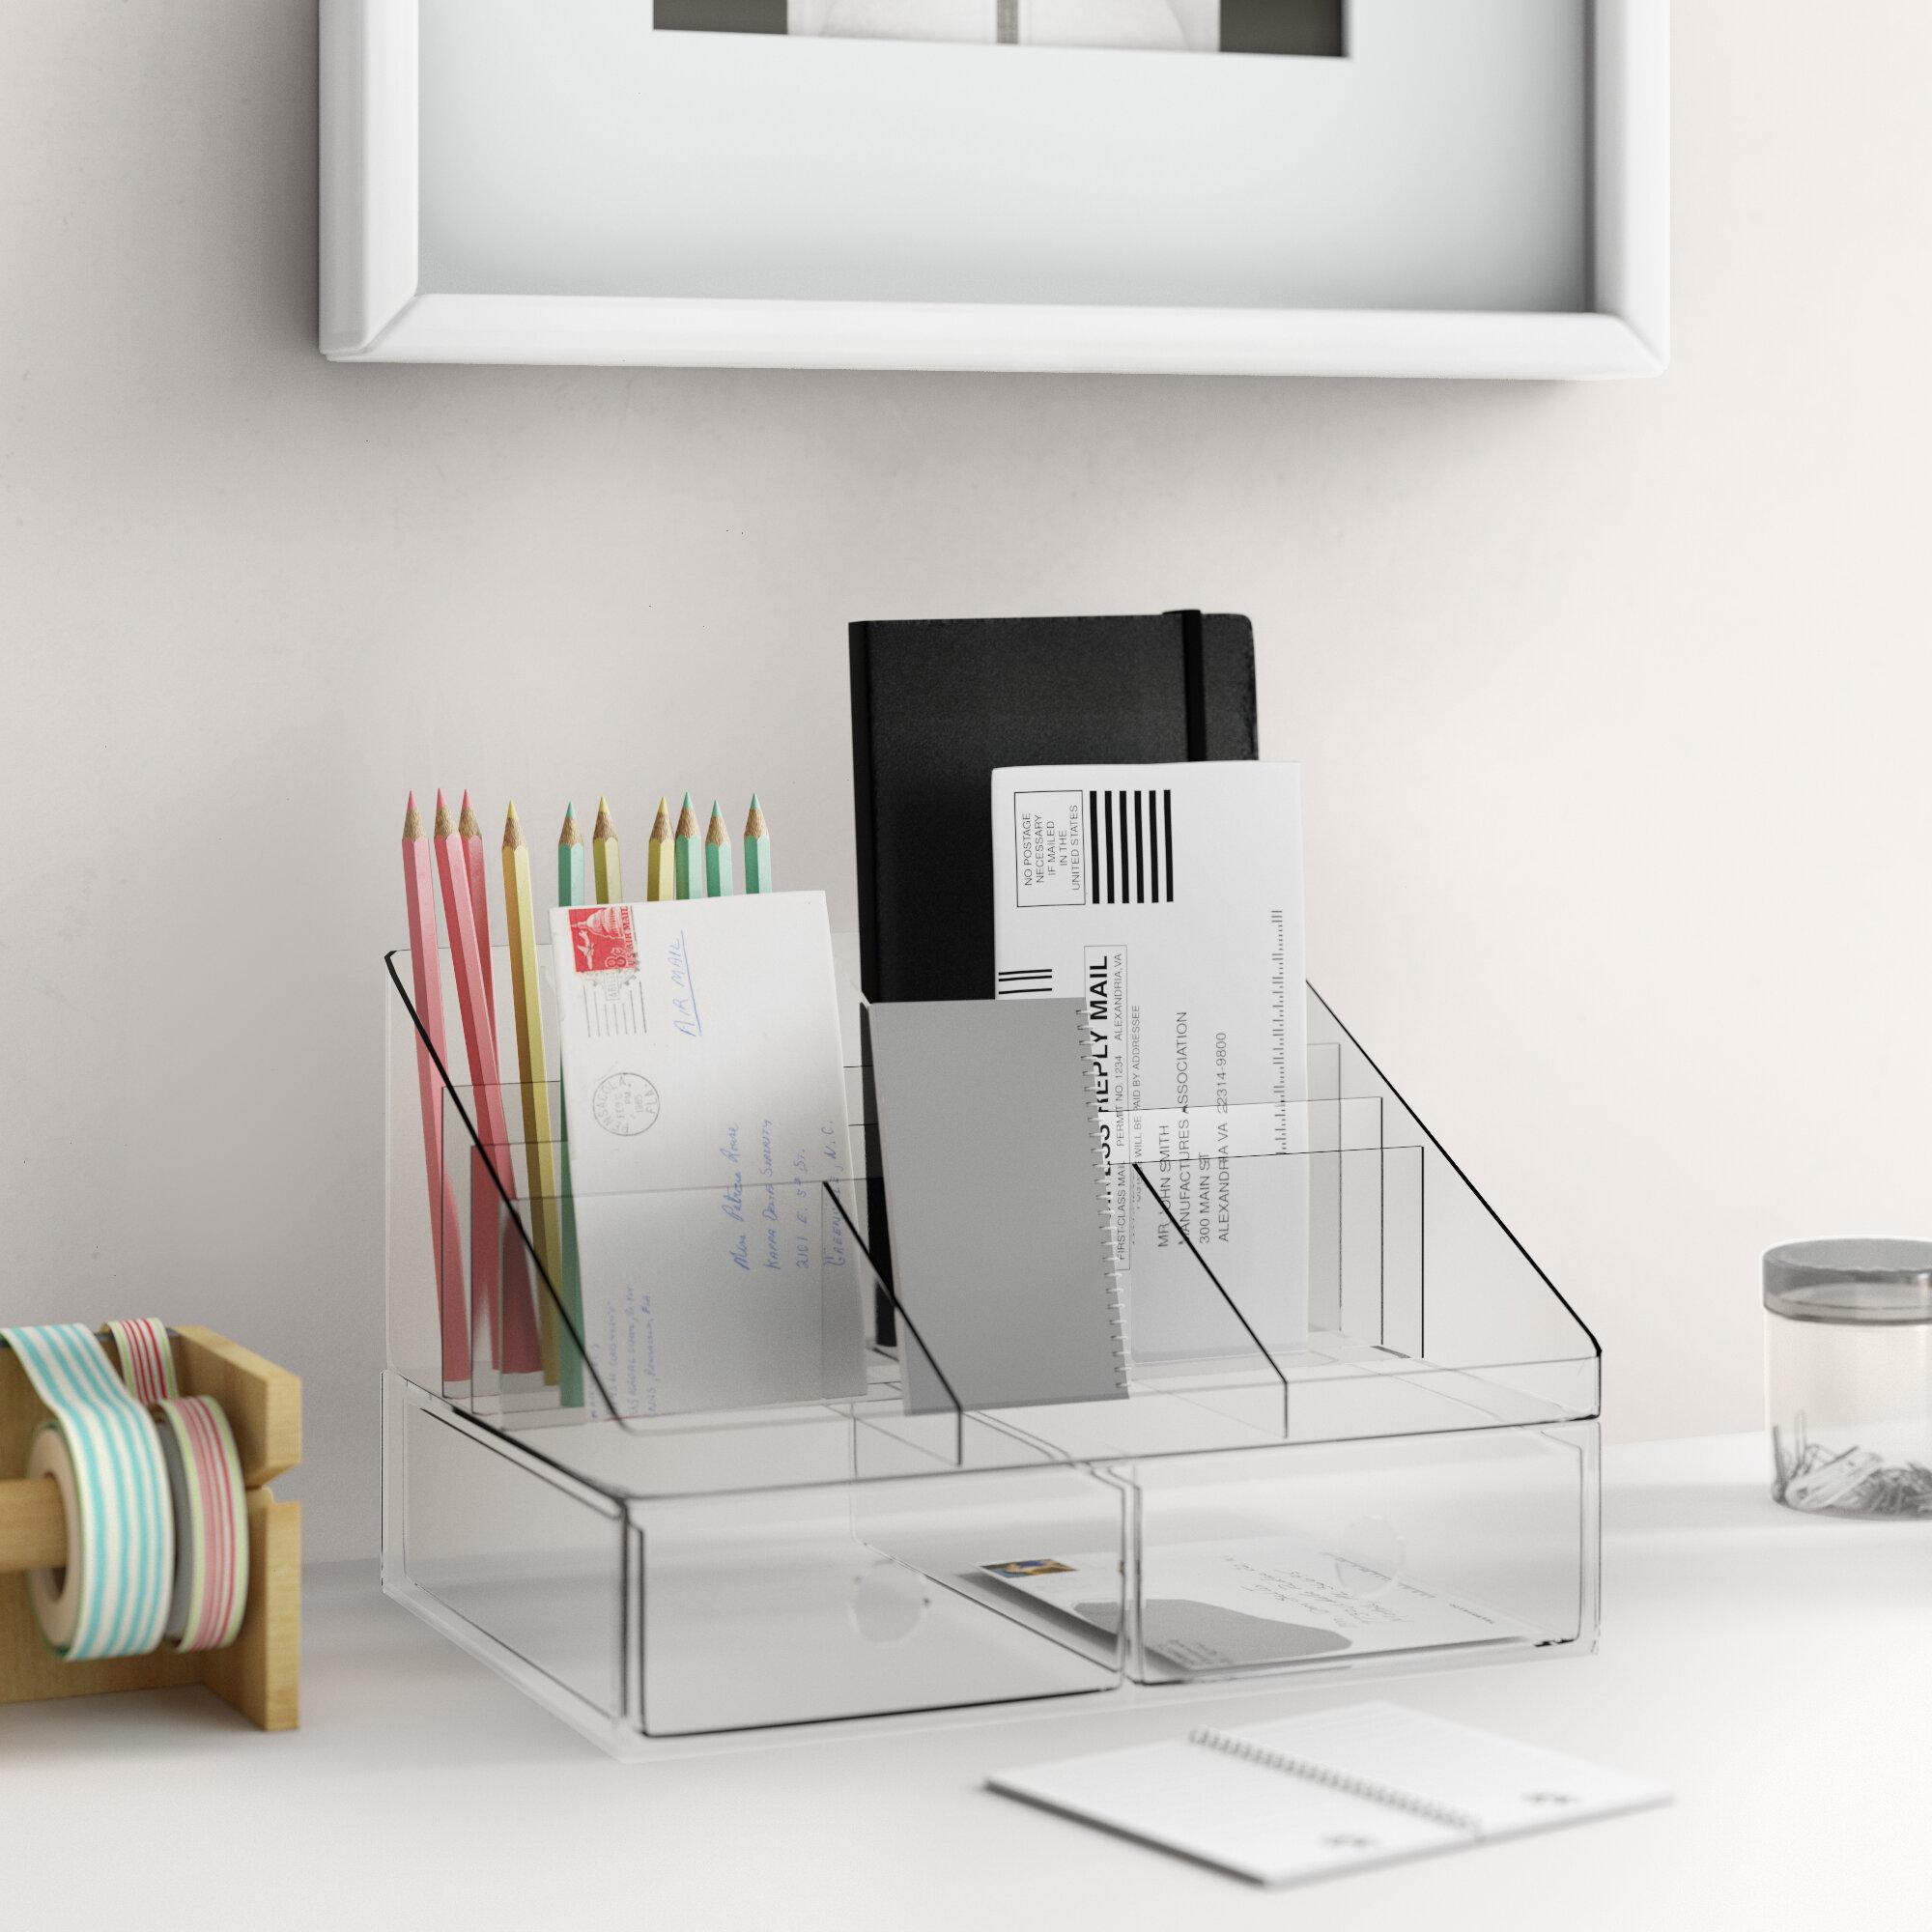 Clear Desktop Organization You Ll Love In 2021 Wayfair